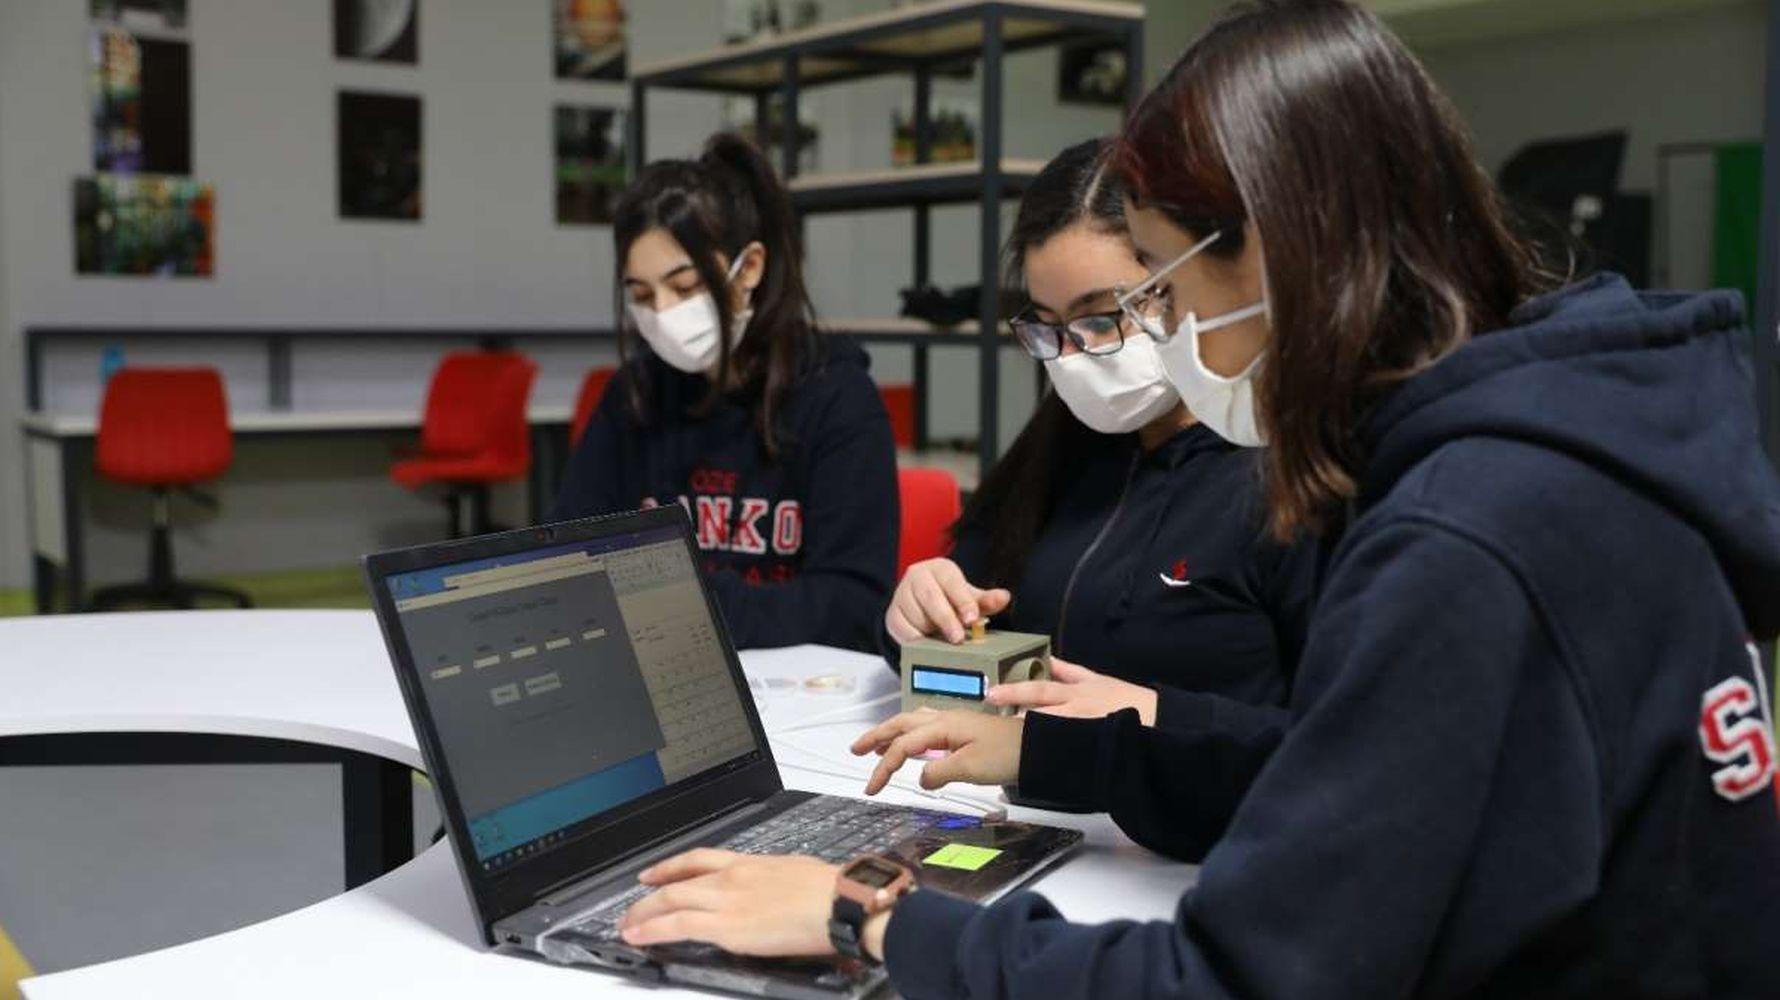 sanko schools students develop coronavirus sensory test device